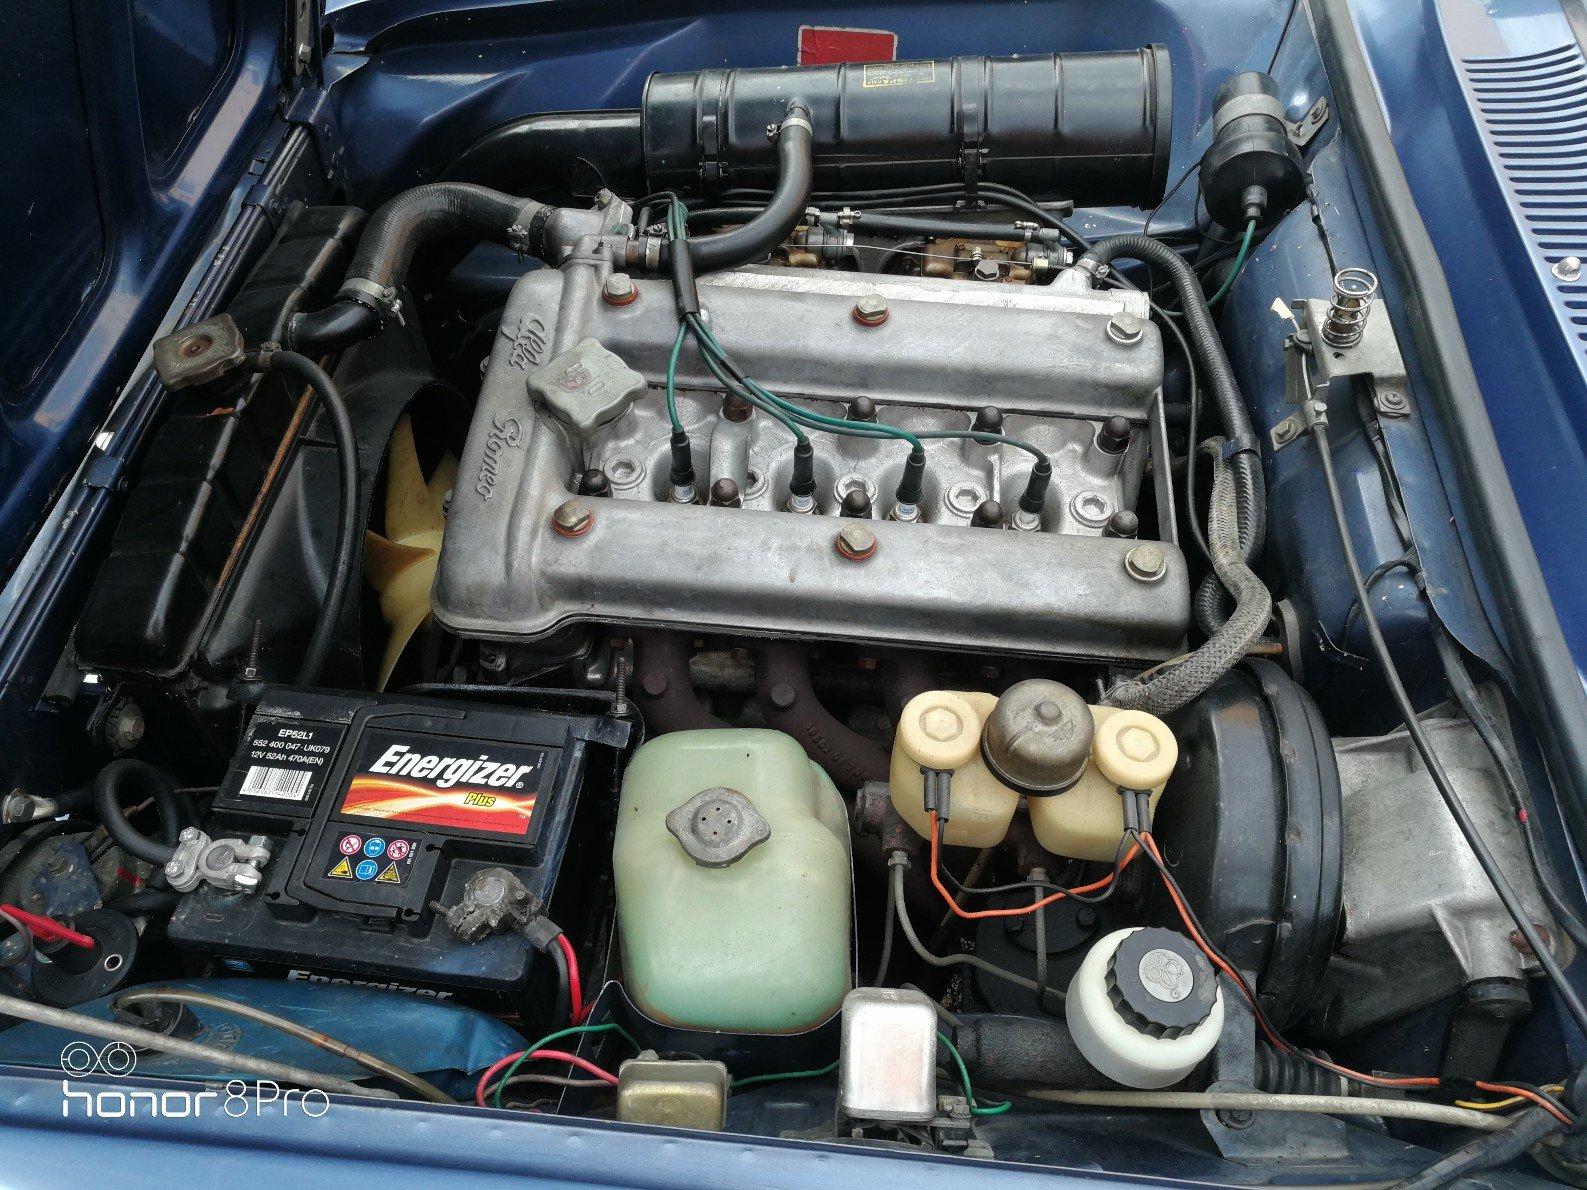 1972 Alfa Romeo 2000 Gt Veloce For Sale (picture 6 of 6)